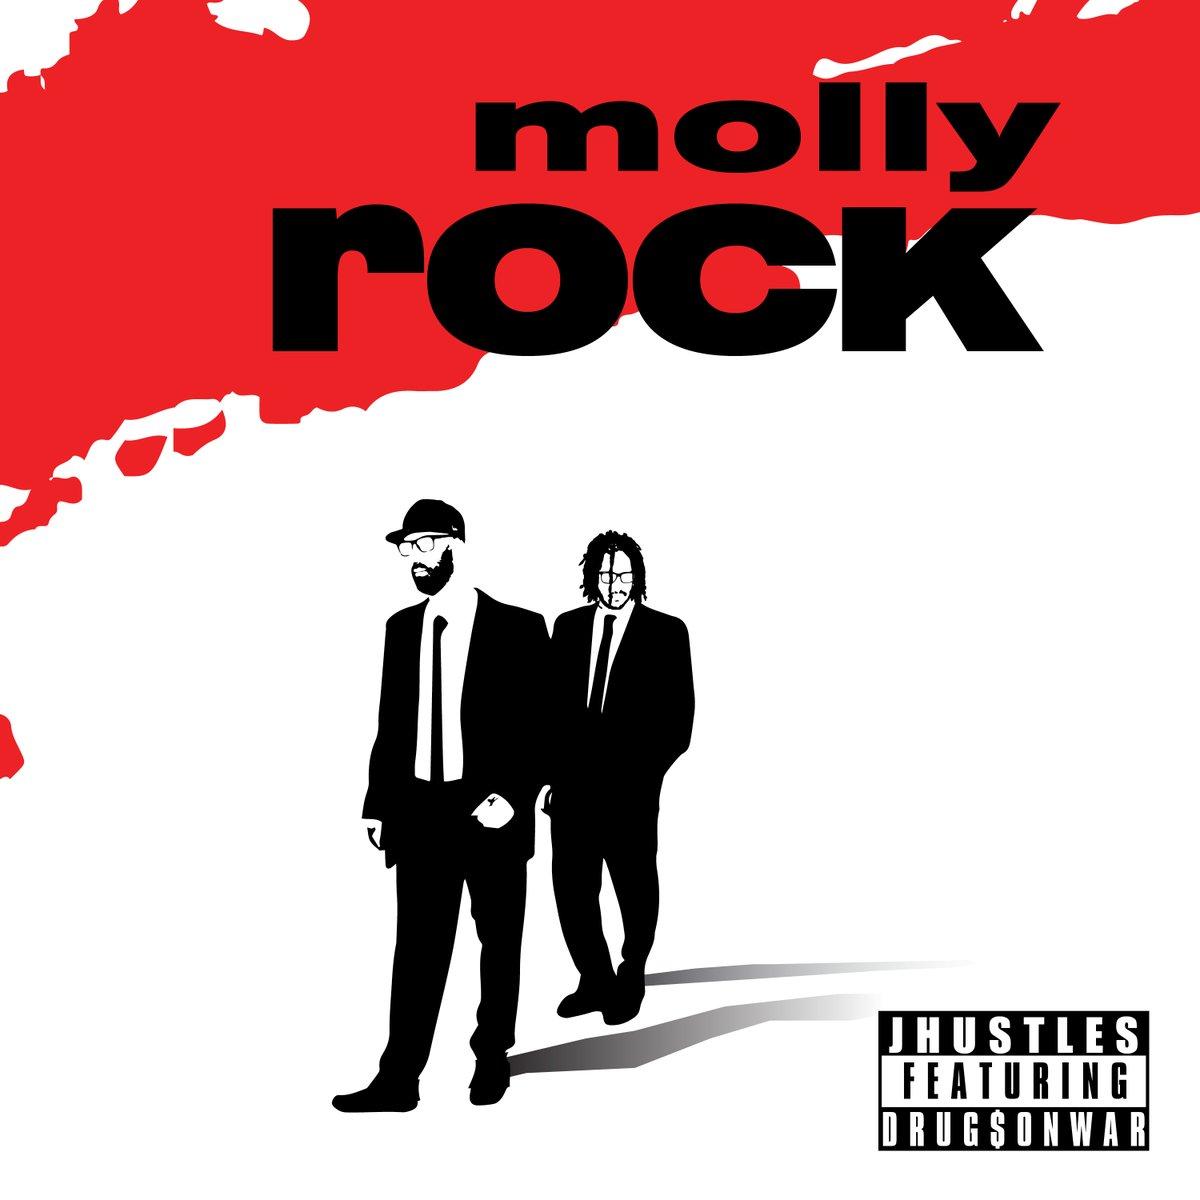 Have you heard my new single featuring #drugsonwar, Molly Rock' by JHUSTLES on #SoundCloud? #np https://t.co/BKVmlbukuh #NewMusic #hiphop #rap #trapbeats https://t.co/eC5U8AV78M